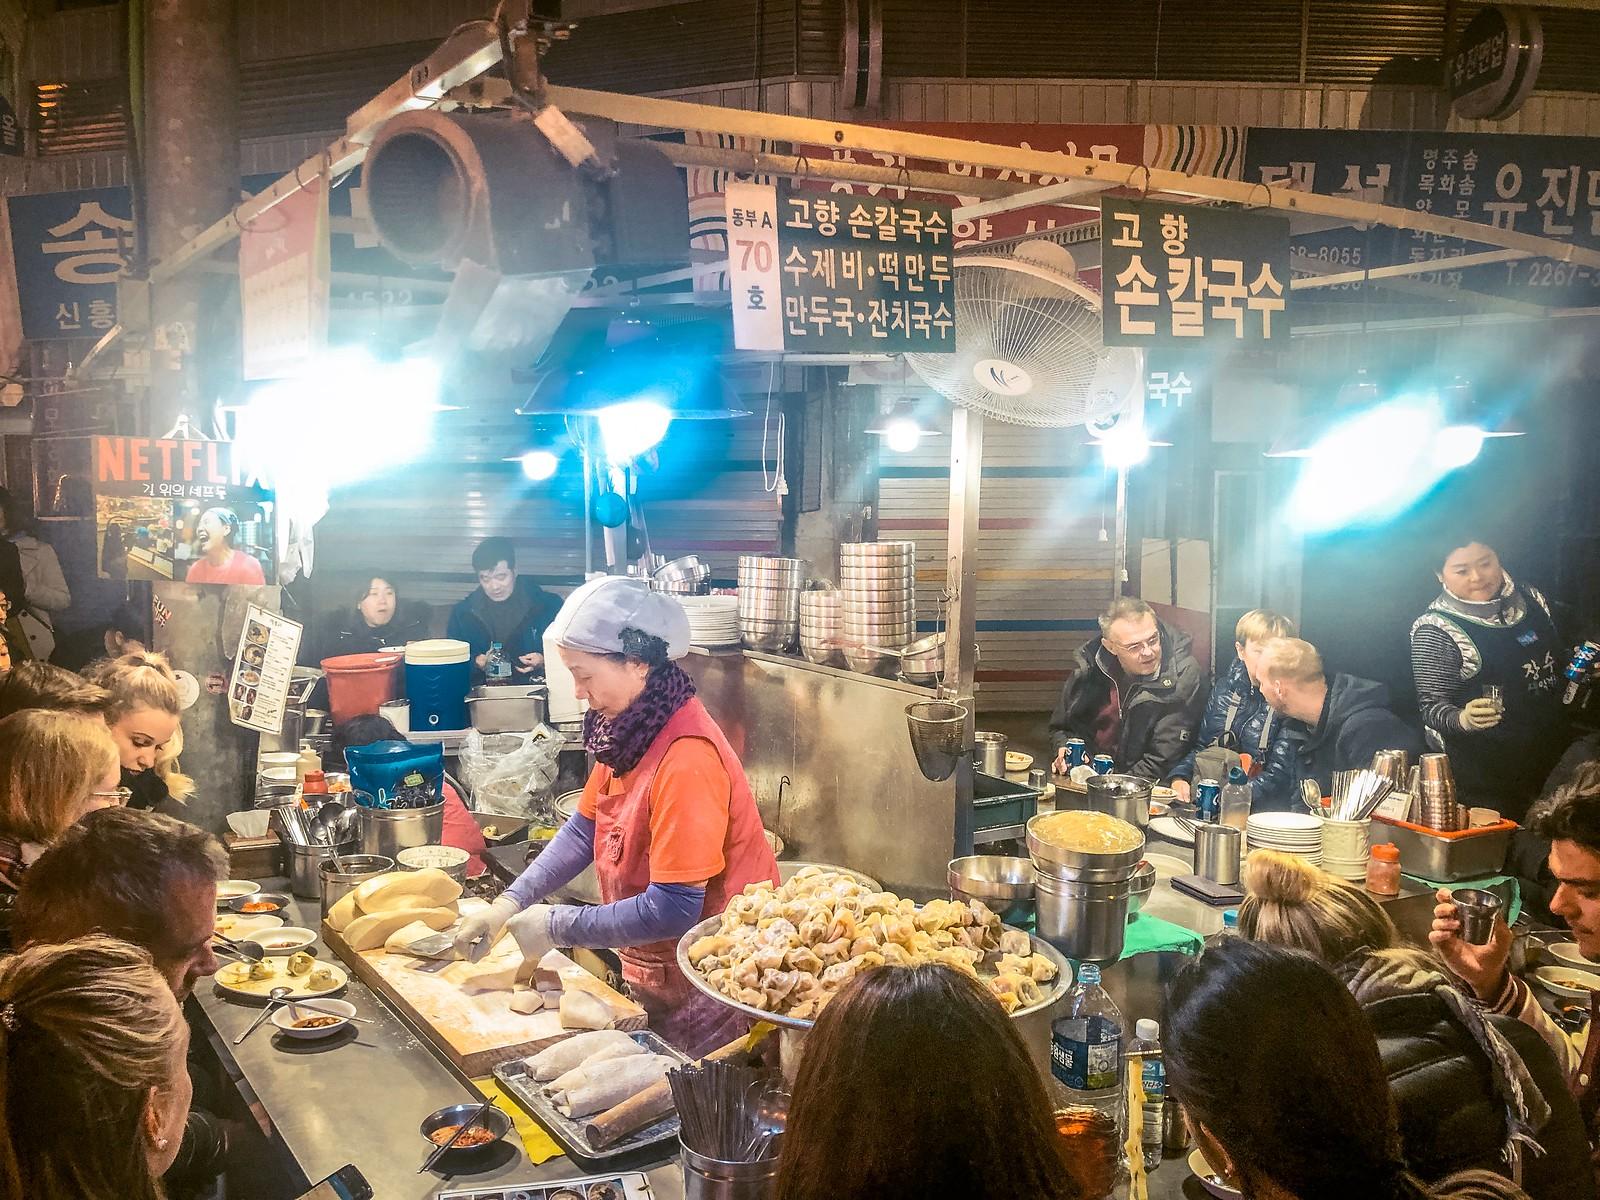 Korean street food at Gwangjang Market   Things to eat in South Korea